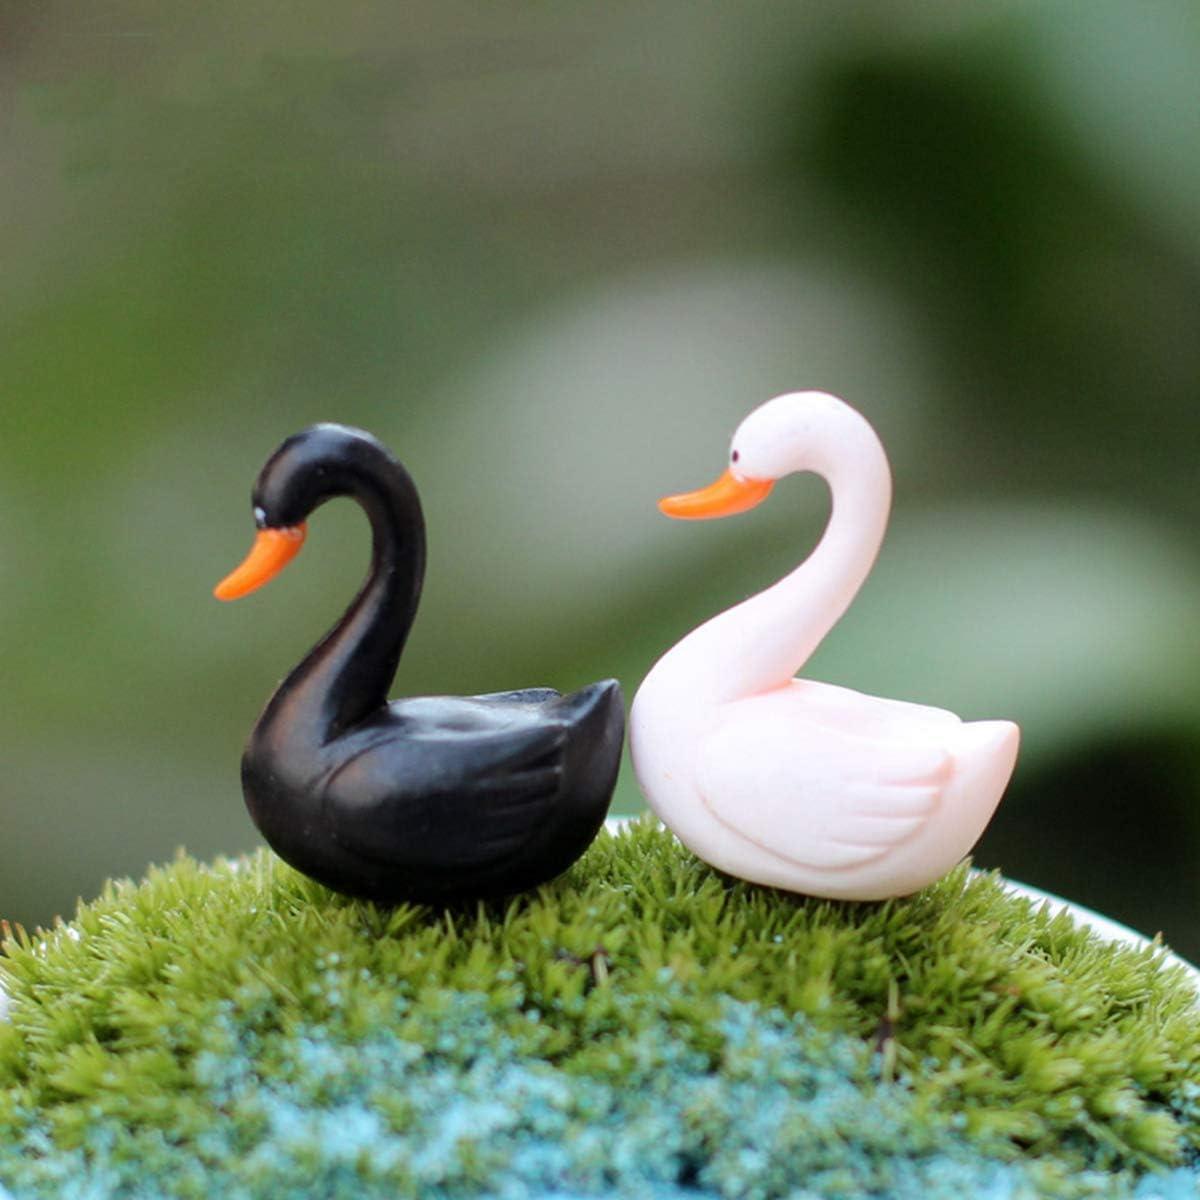 DAWEIF 10pcs Mini Black White Swan Miniature Figurine Fairy Garden Mini Bonsai DIY Love Ducks Ornaments Desktop Decoration(Black&White)